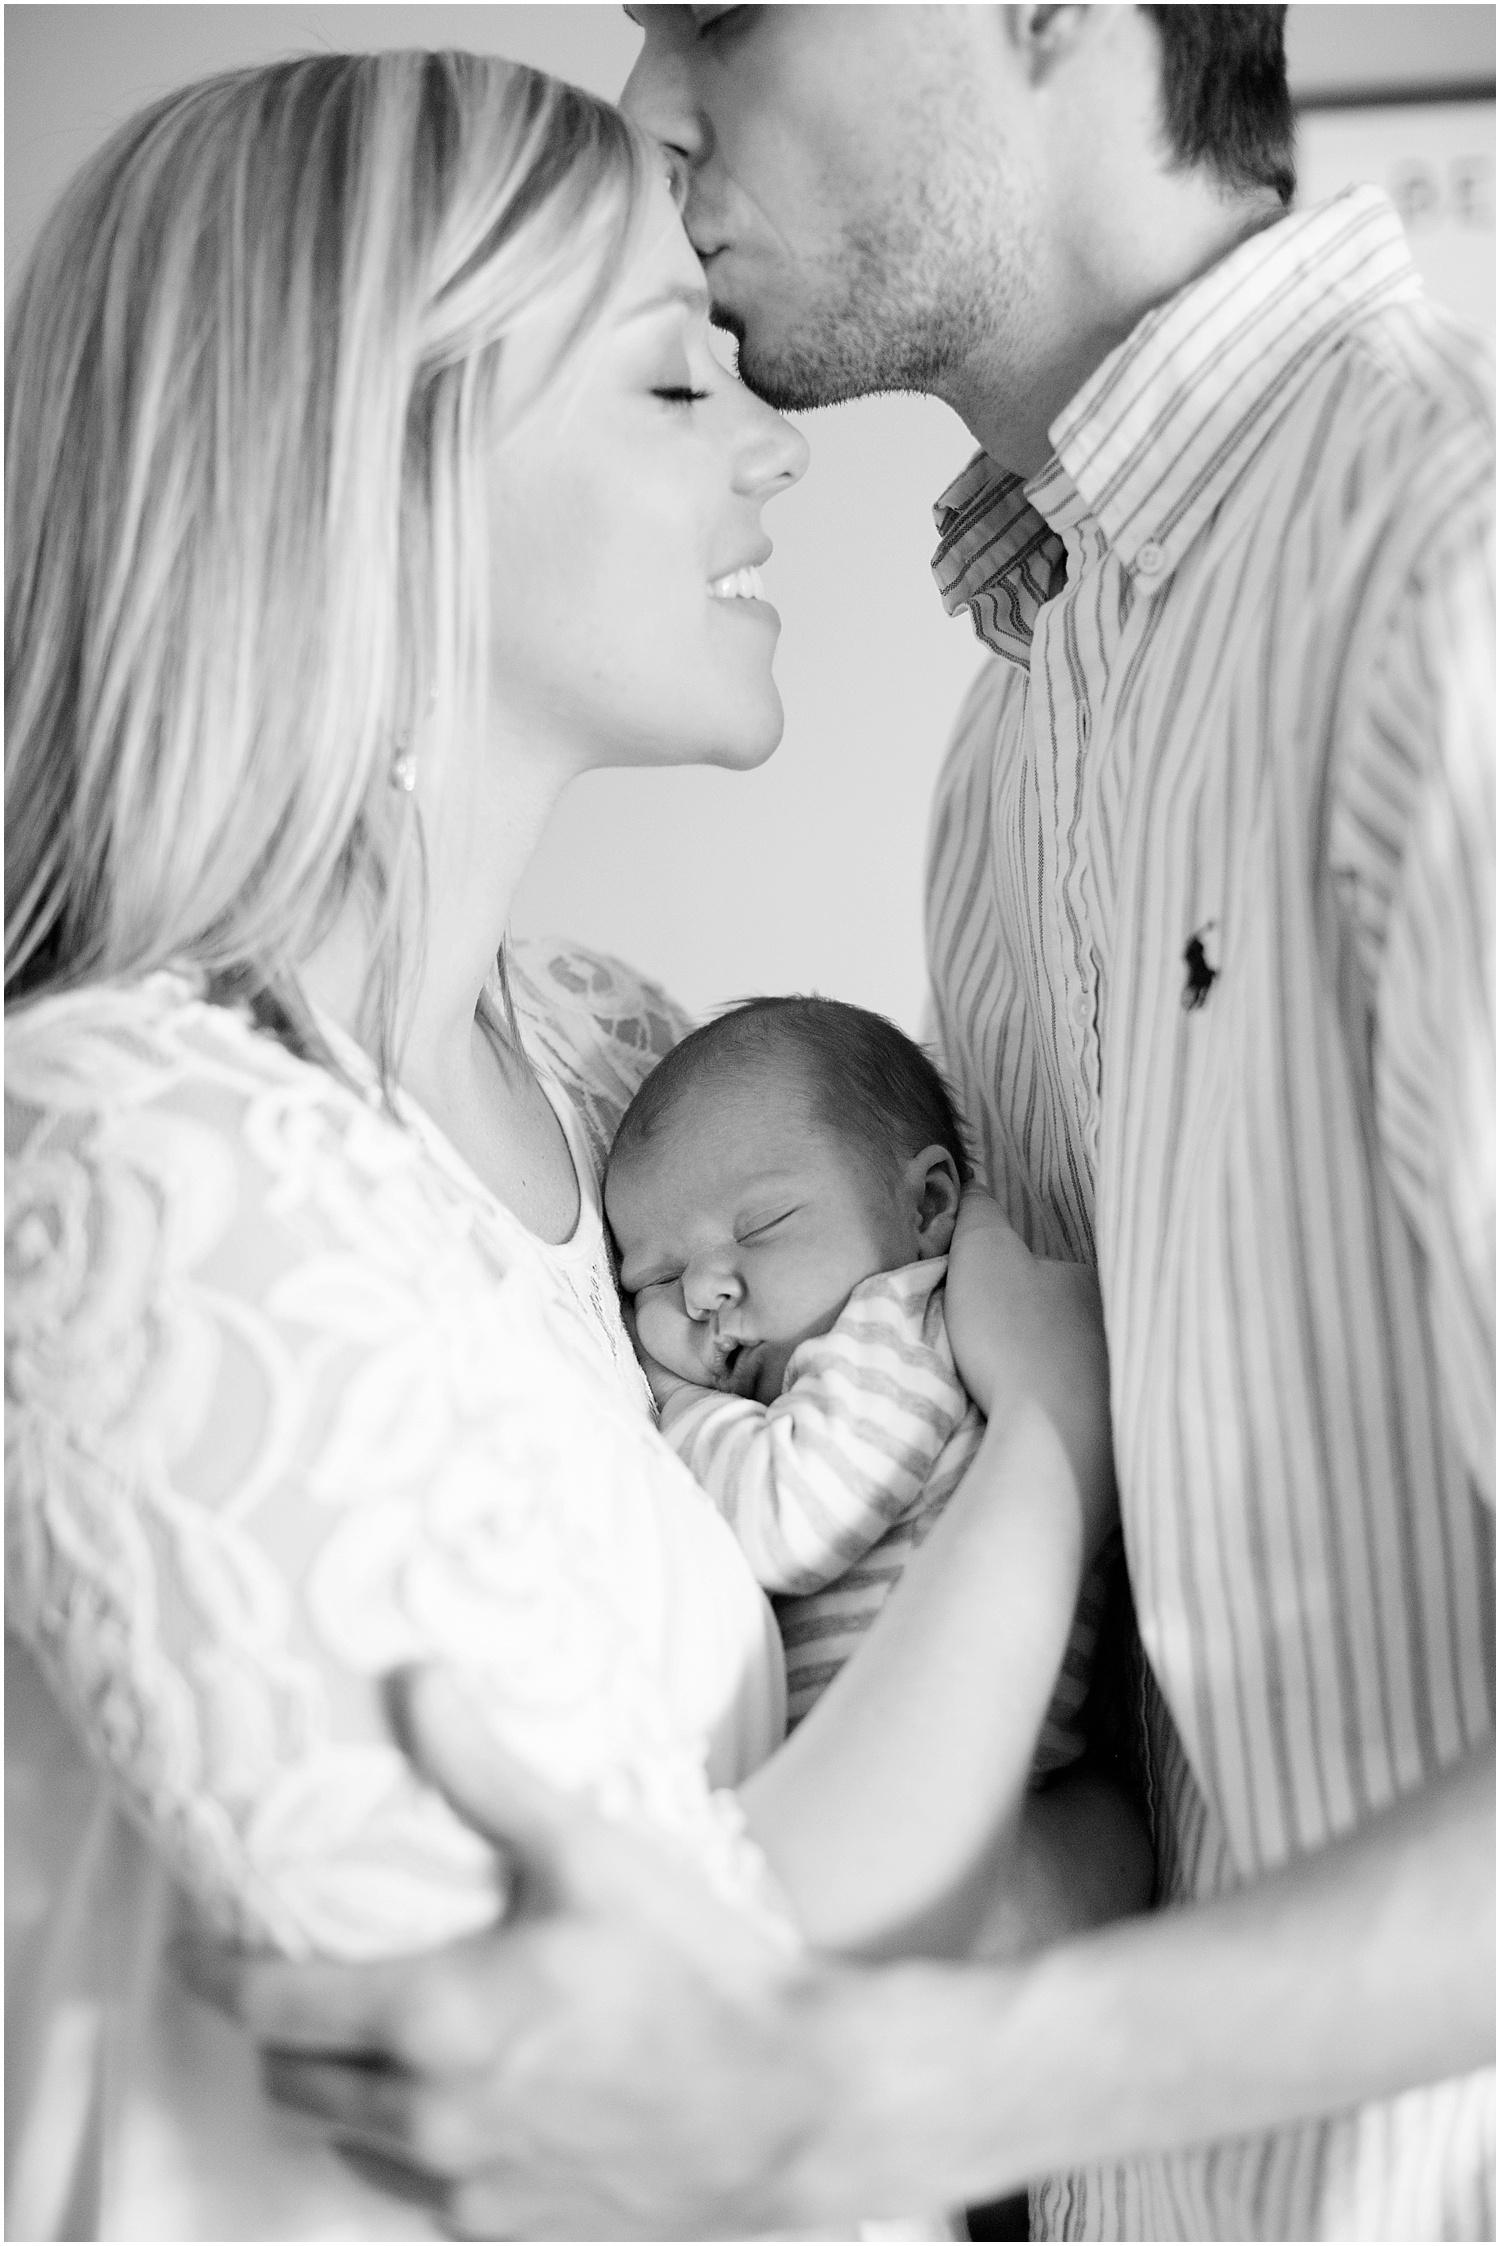 Ashley Powell Photography Grayson Newborn Session_0017.jpg